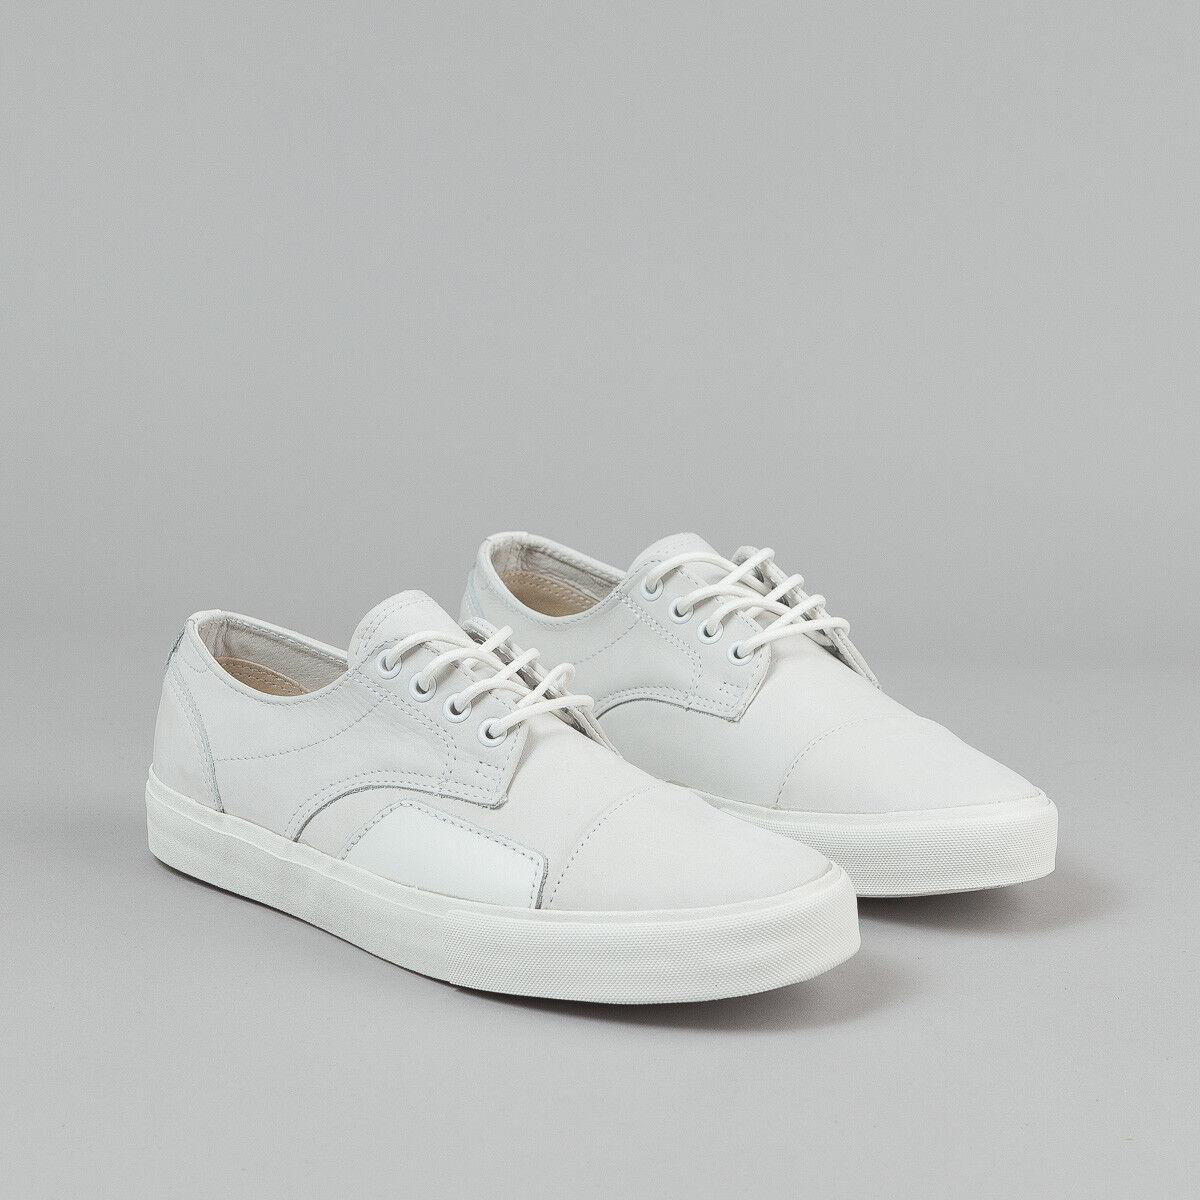 Vans Syndicate Luke Meier Seylynn 'S'Chaussuresblanc Dill AVE Limited Edition 12